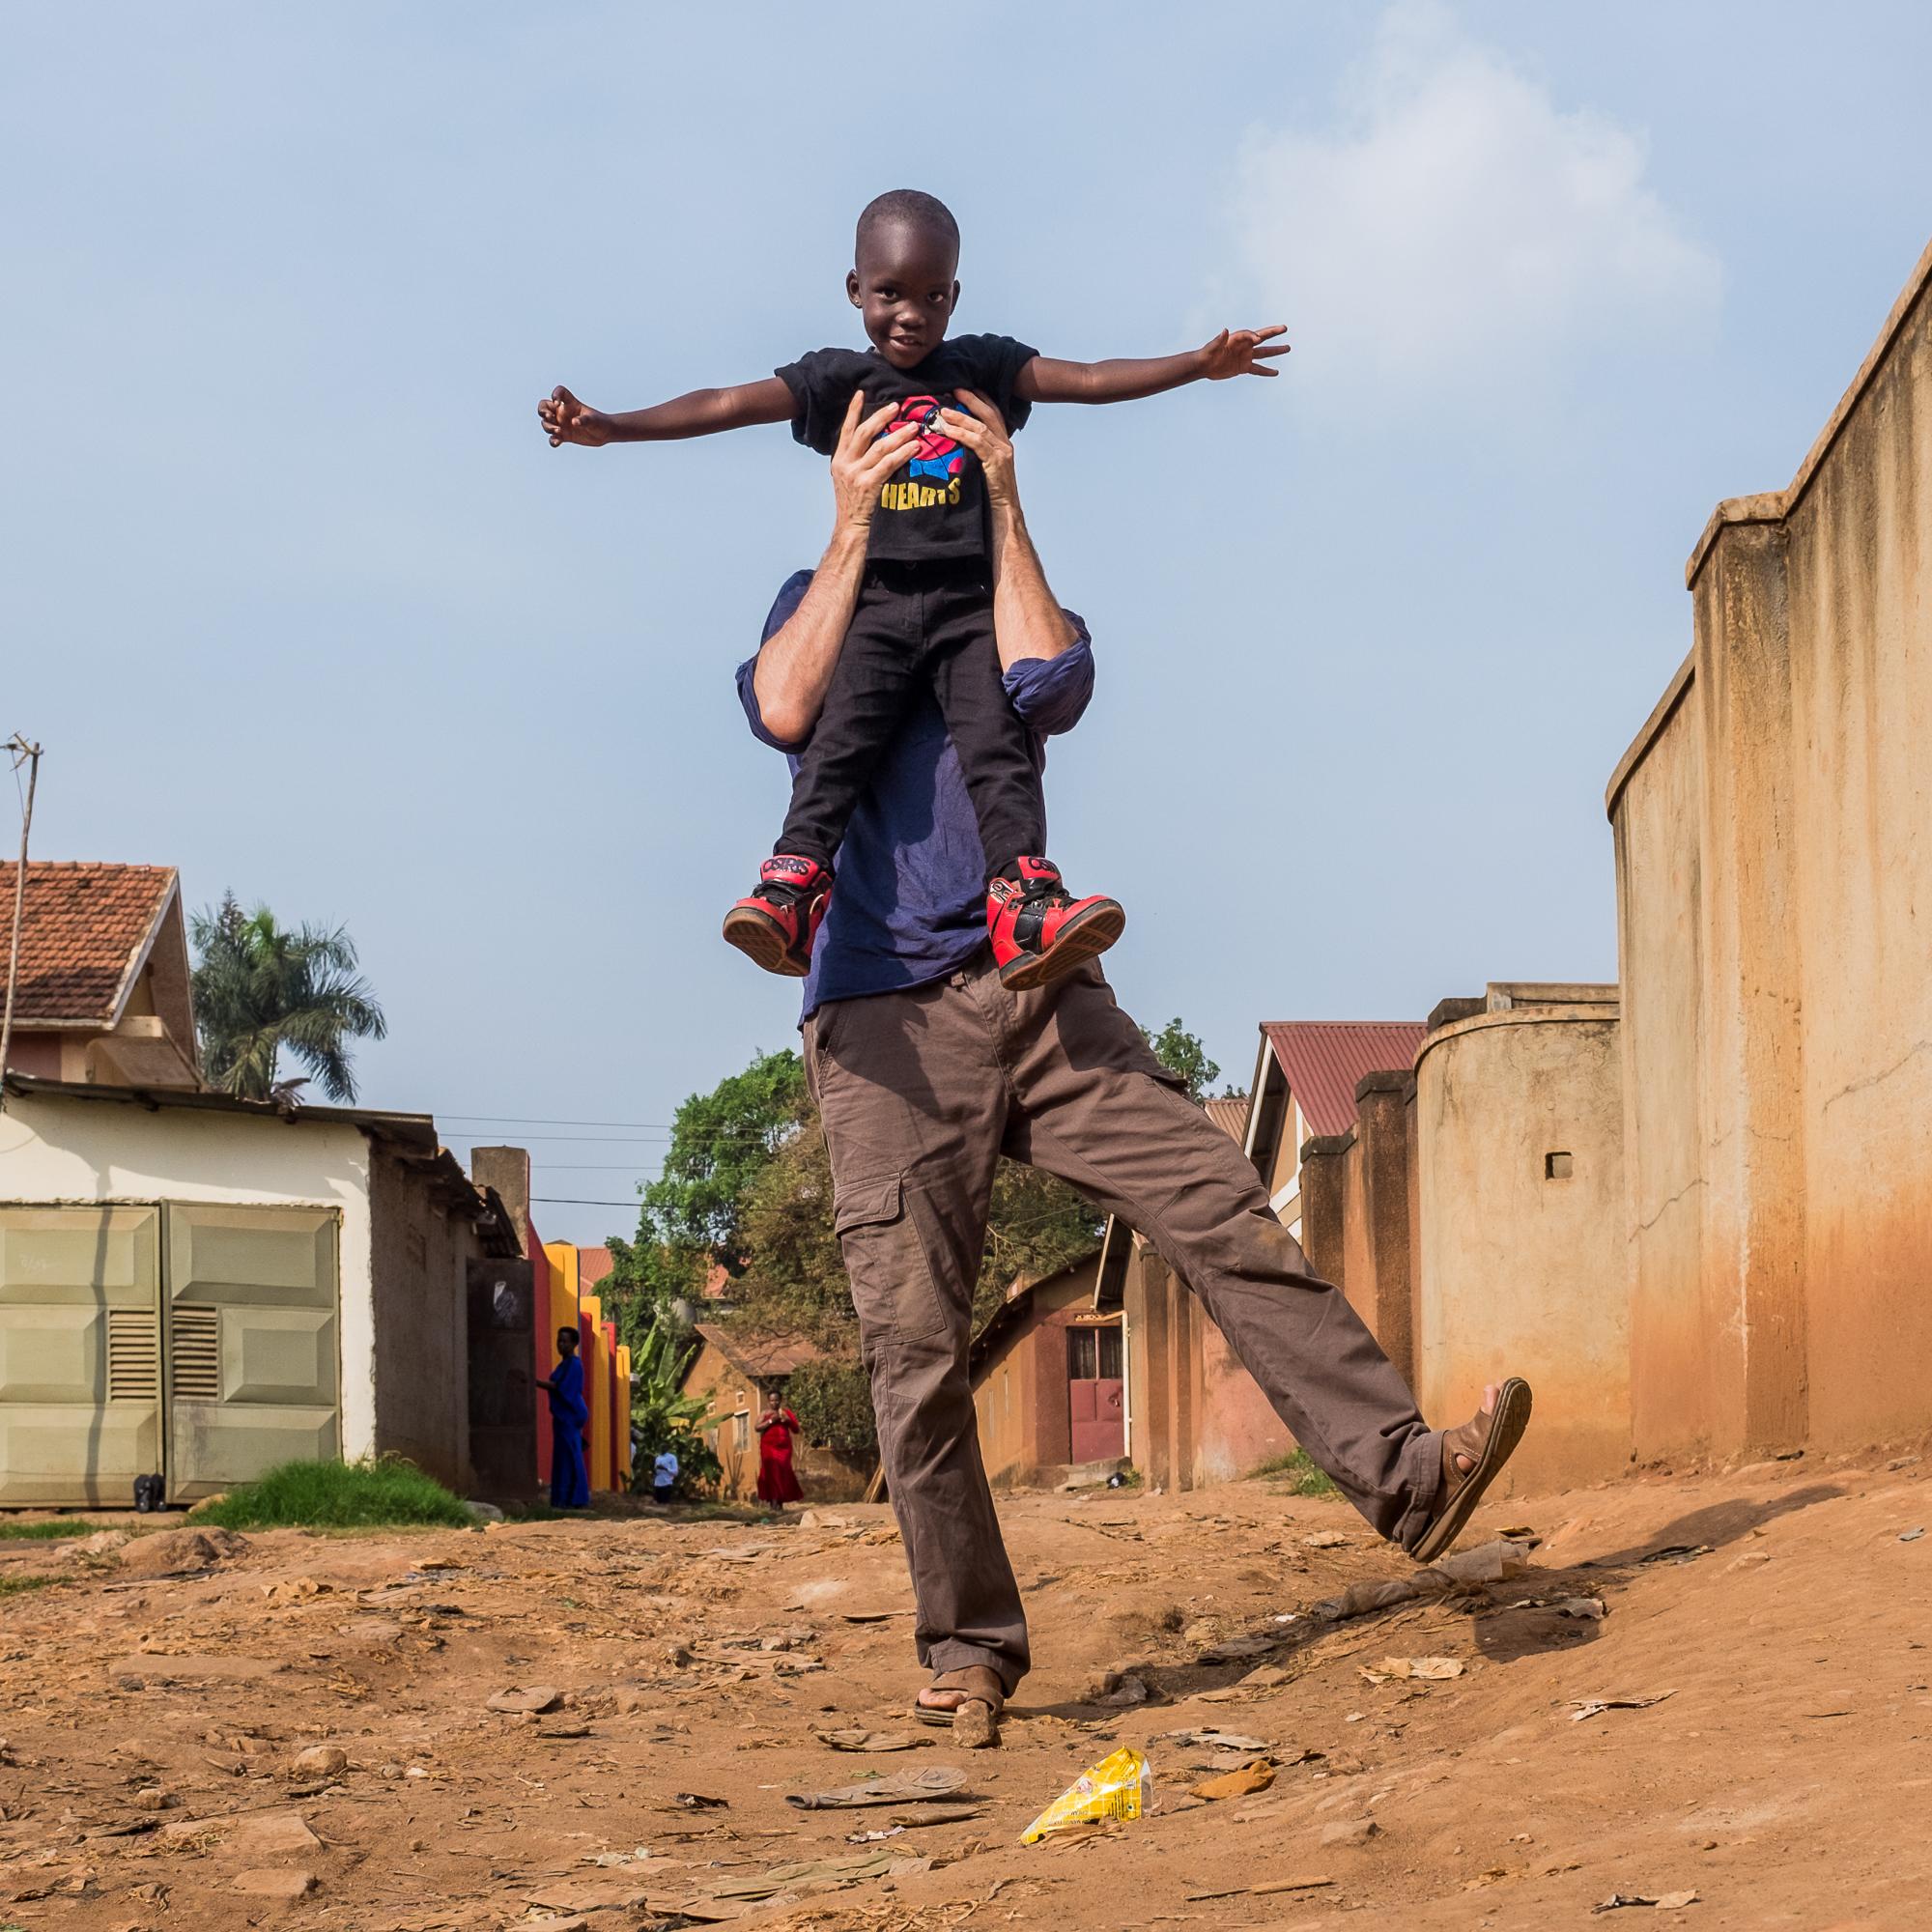 Busega - On one foot